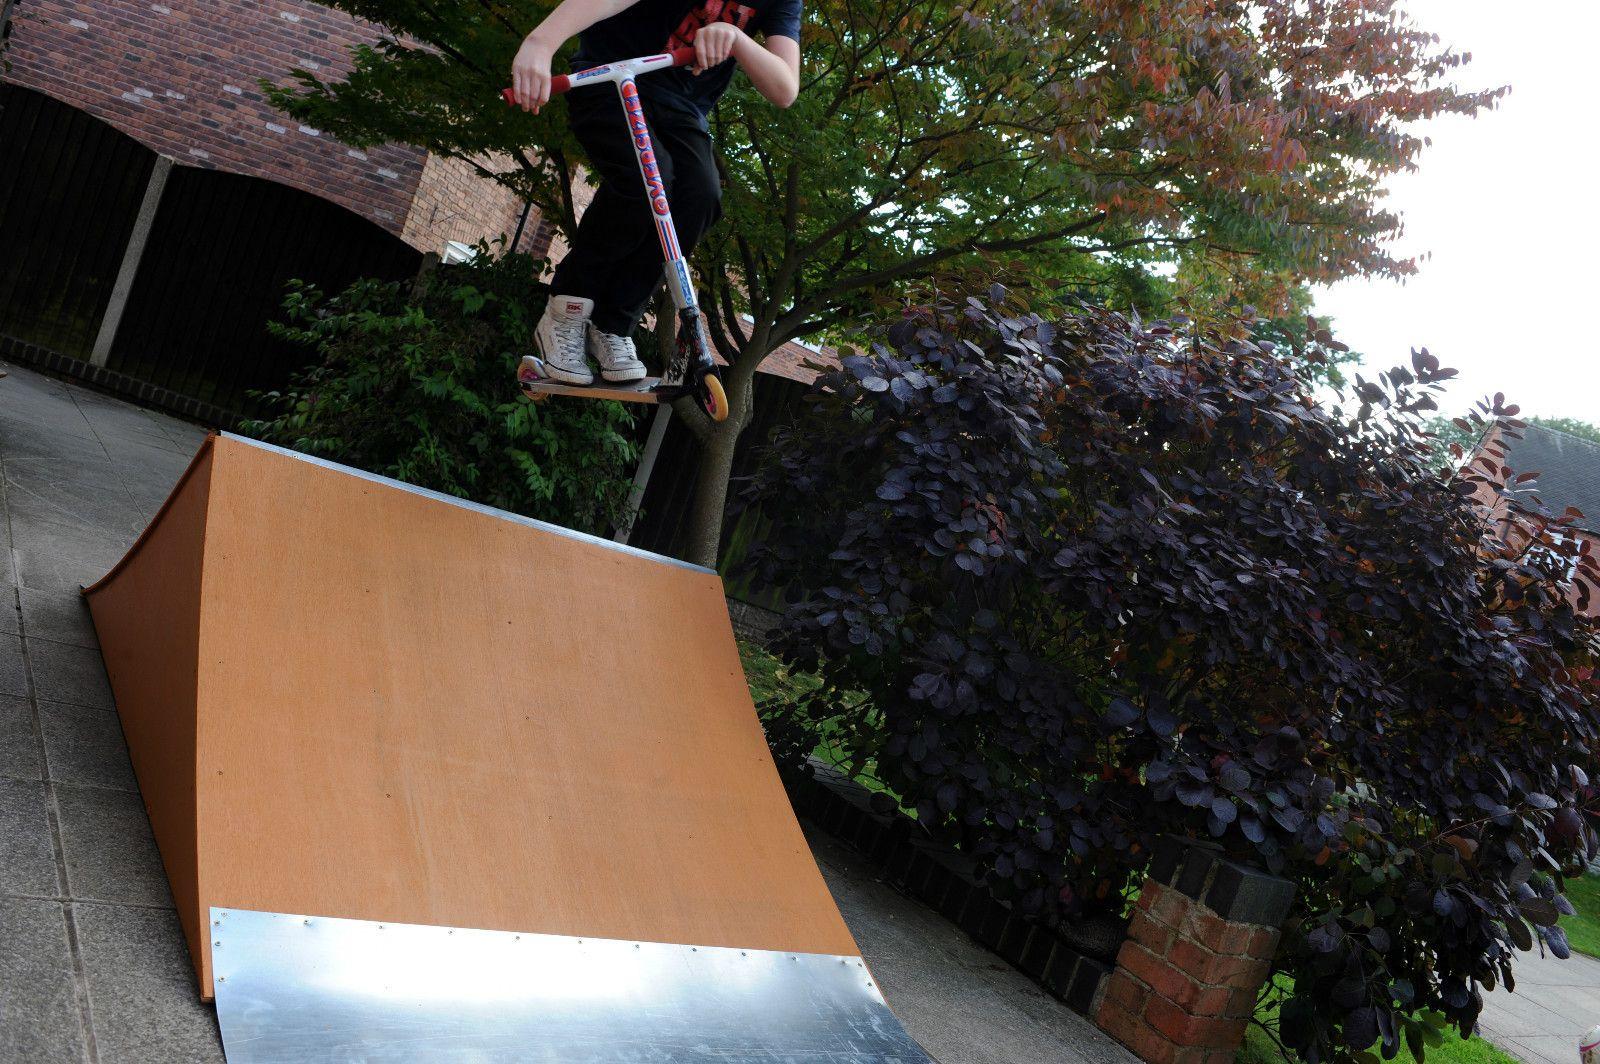 Scooter, Skate board, roller, BMX SPINE Ramp : diy skateboarding : Pinterest : BMX, Skateboard ...